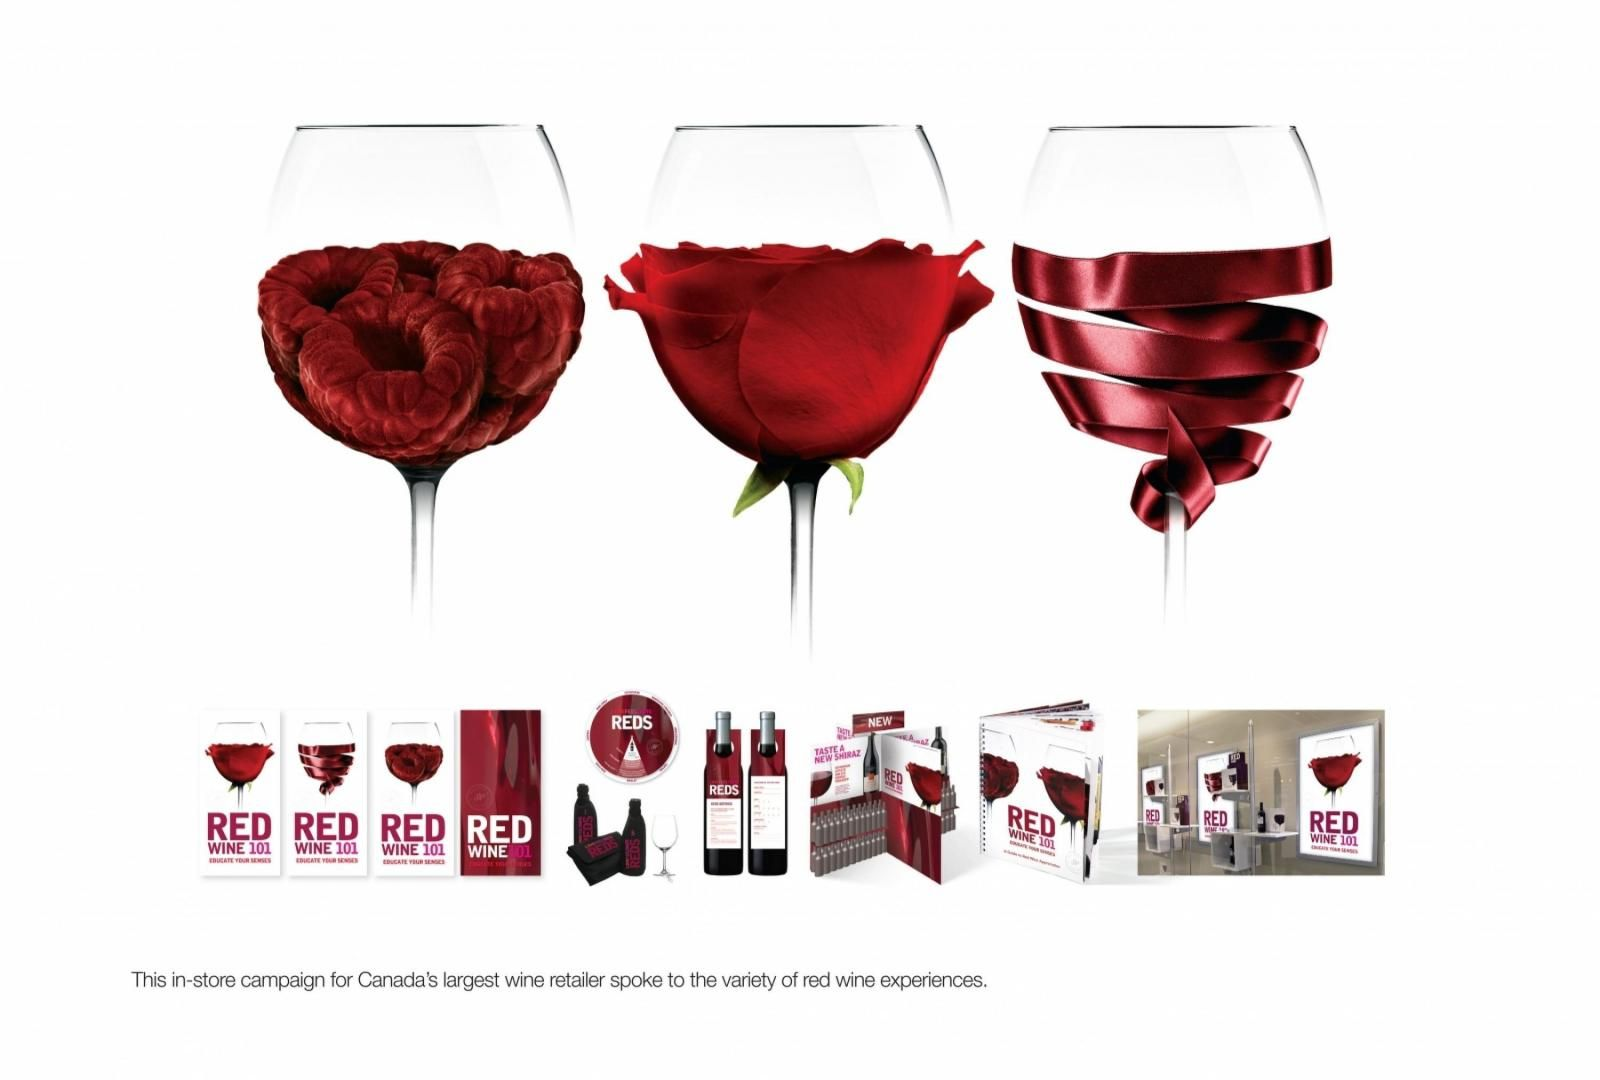 Red Wine Lcbo Red Wine 1600 64709 Jpg 1 600 1 080 Pixeles Red Wine Wine Design Wine Wallpaper